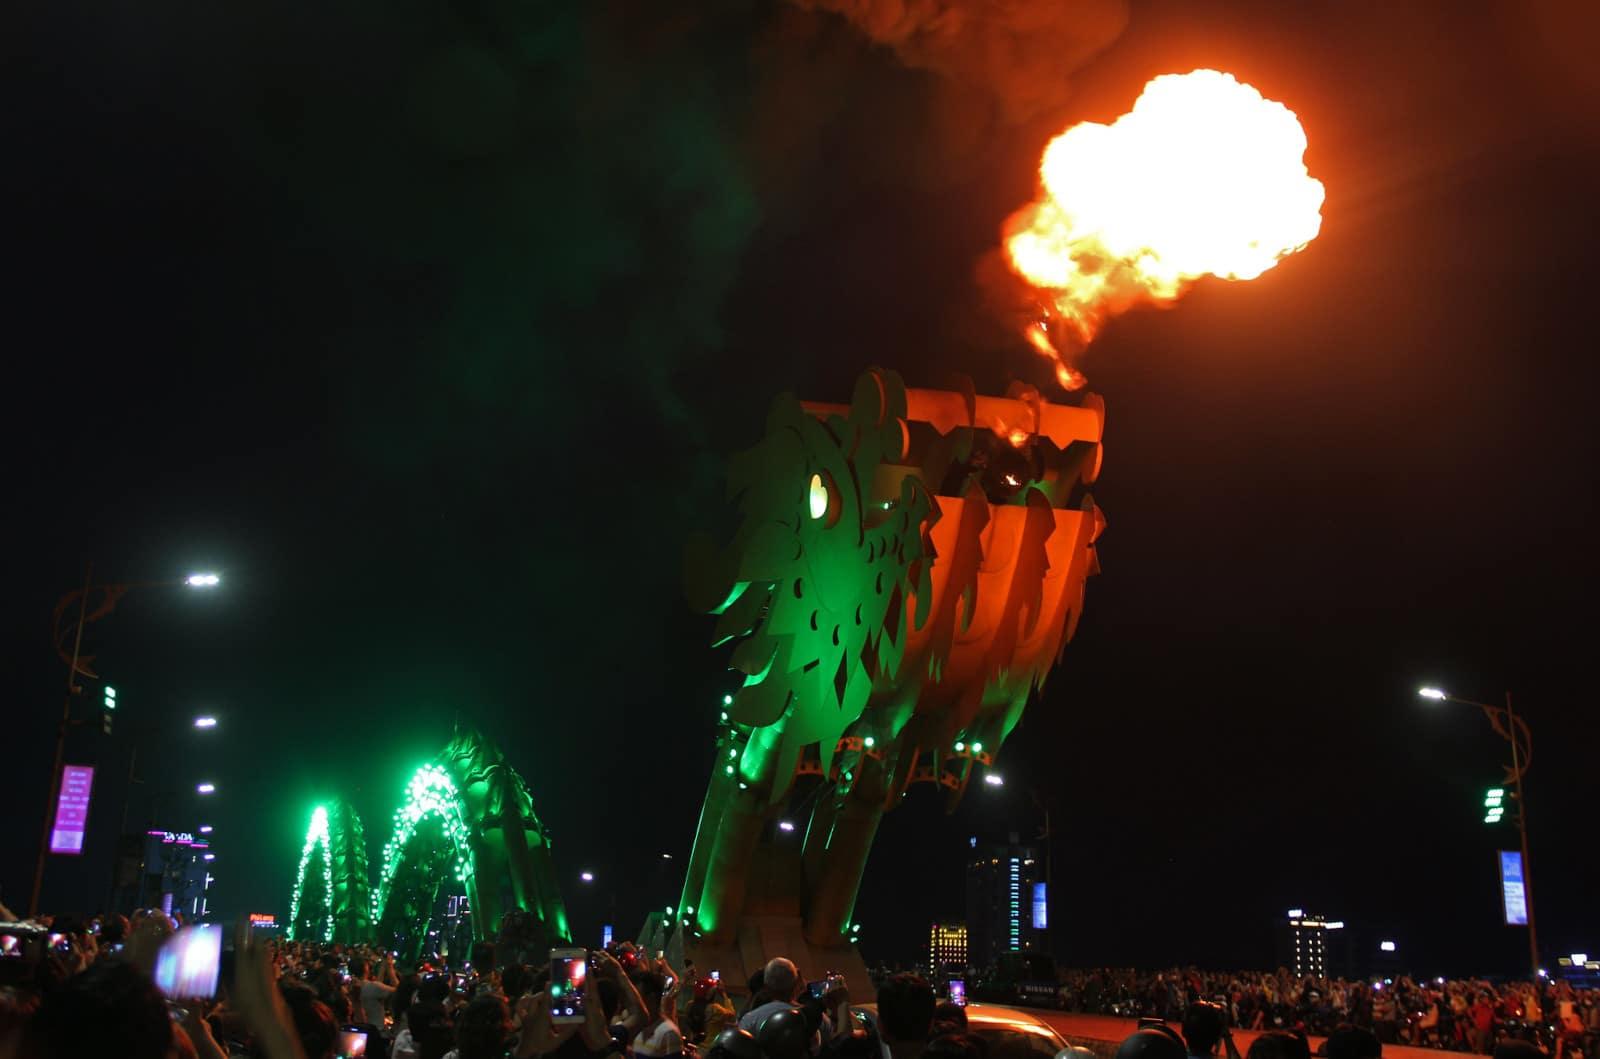 Image of the Dragon Bridge in Da Nang, Vietnam breathing fire